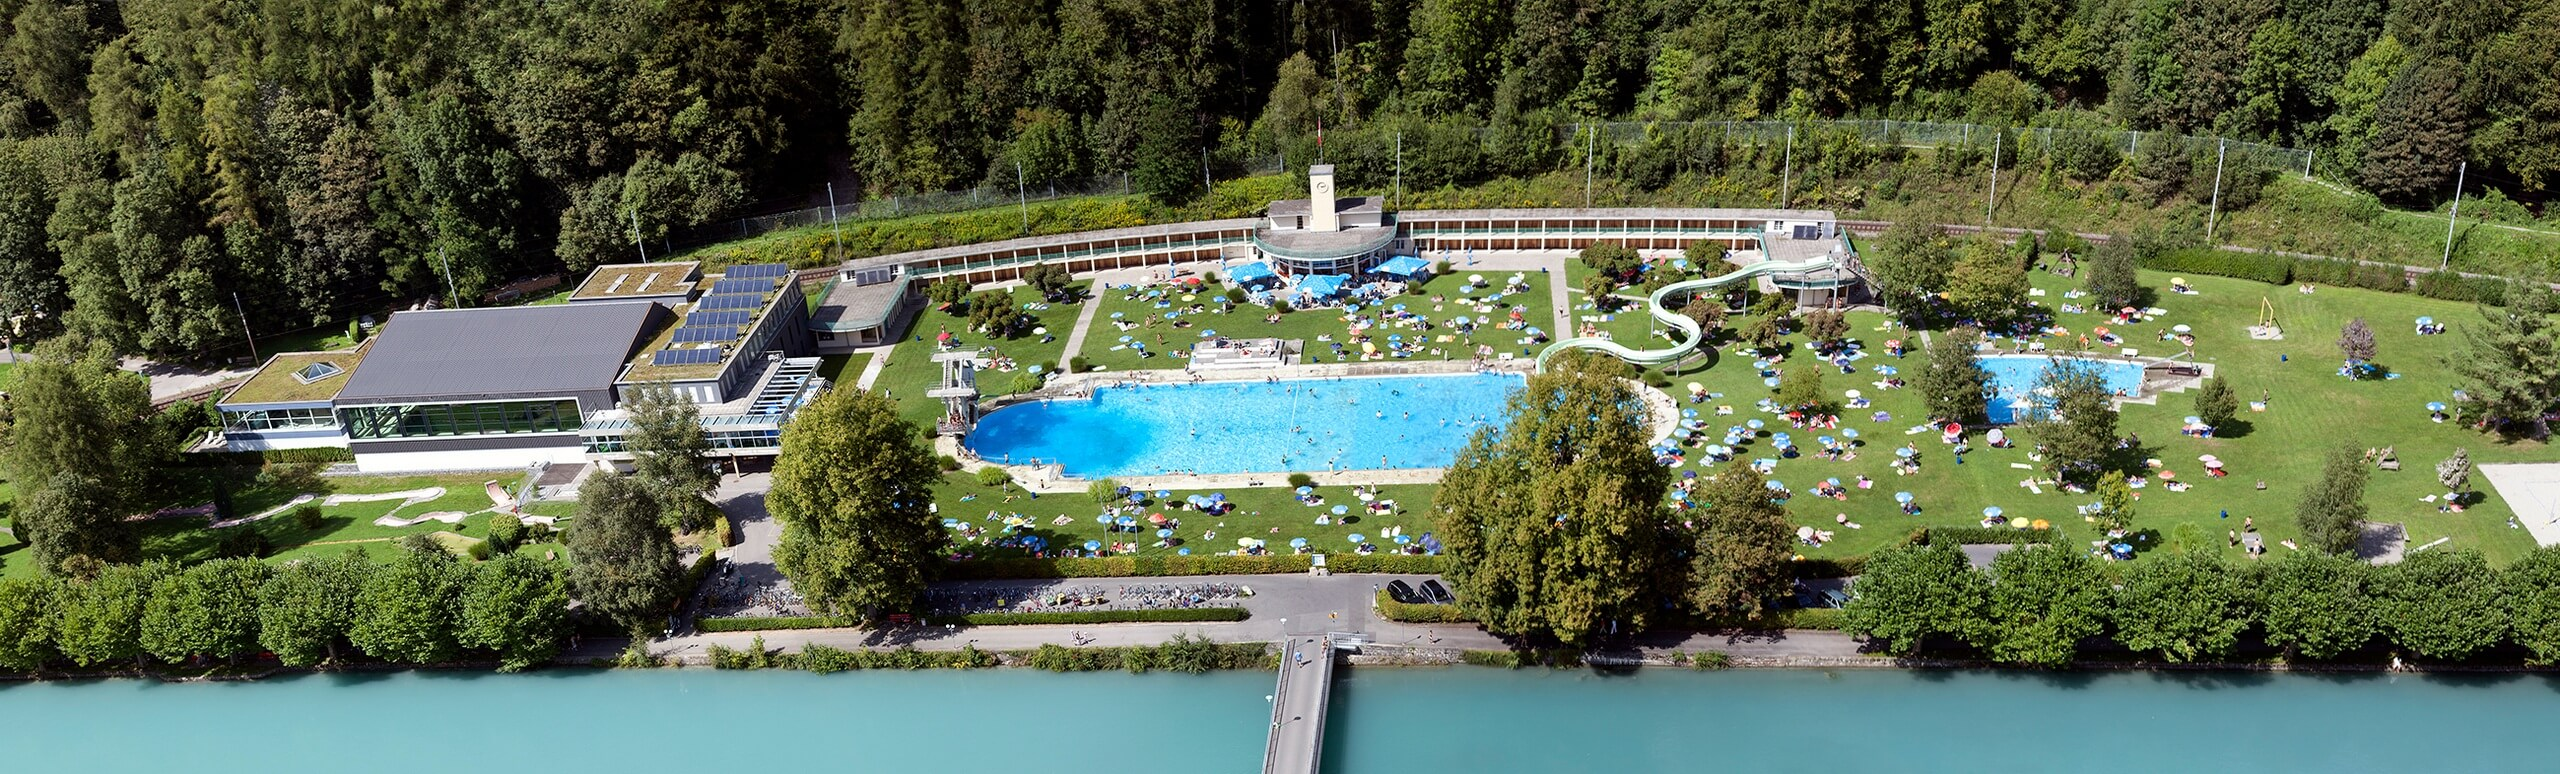 interlaken-boedelibad-auusenbad-sommer-panorama